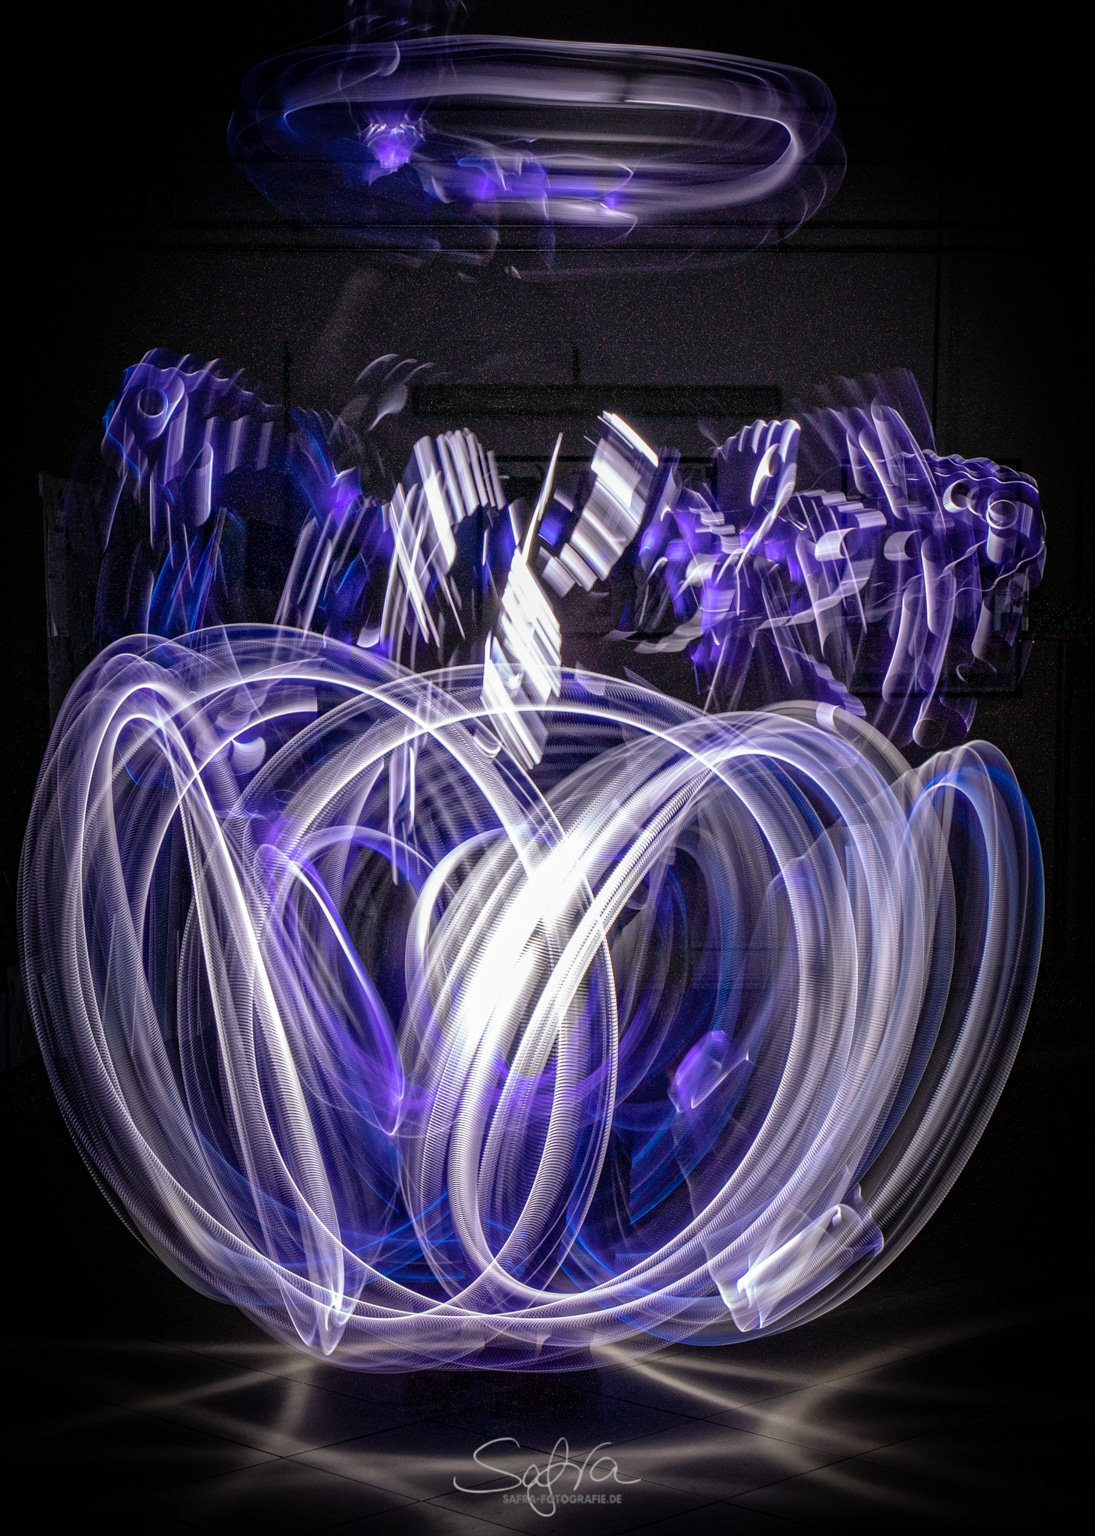 Lightpainting, Taschenlampen